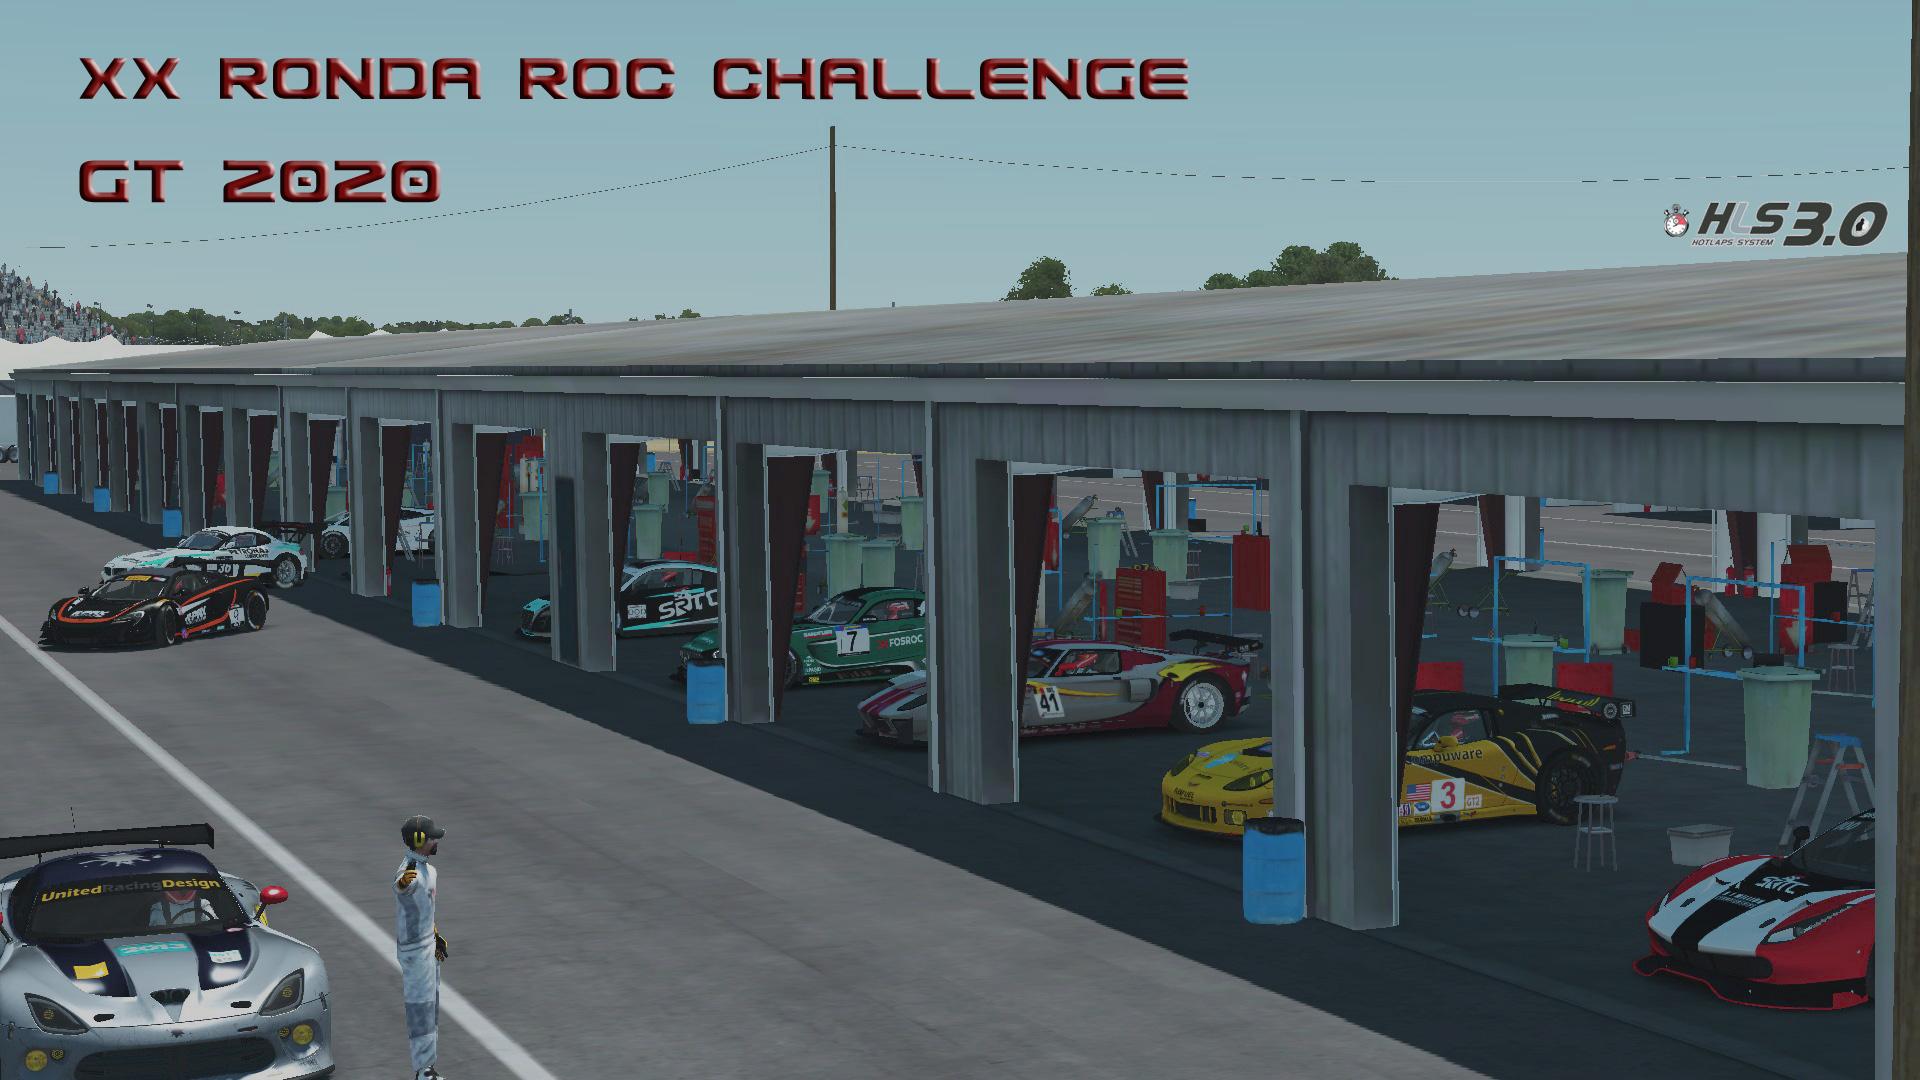 XX Ronda ROC Challenge GT 2020